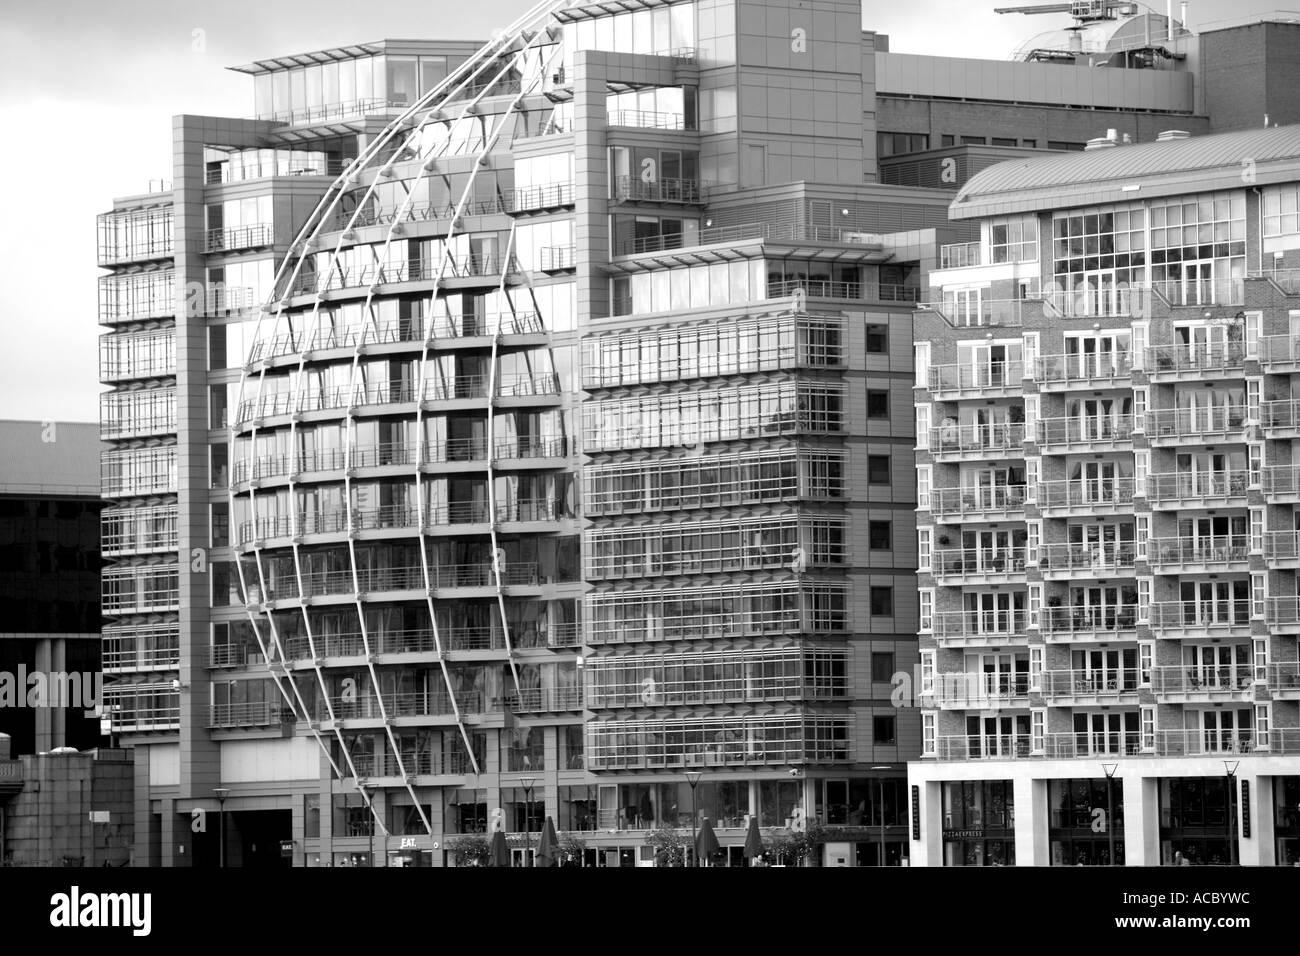 Unique architecture along the river Thames. London England. UK. United Kingdom. - Stock Image